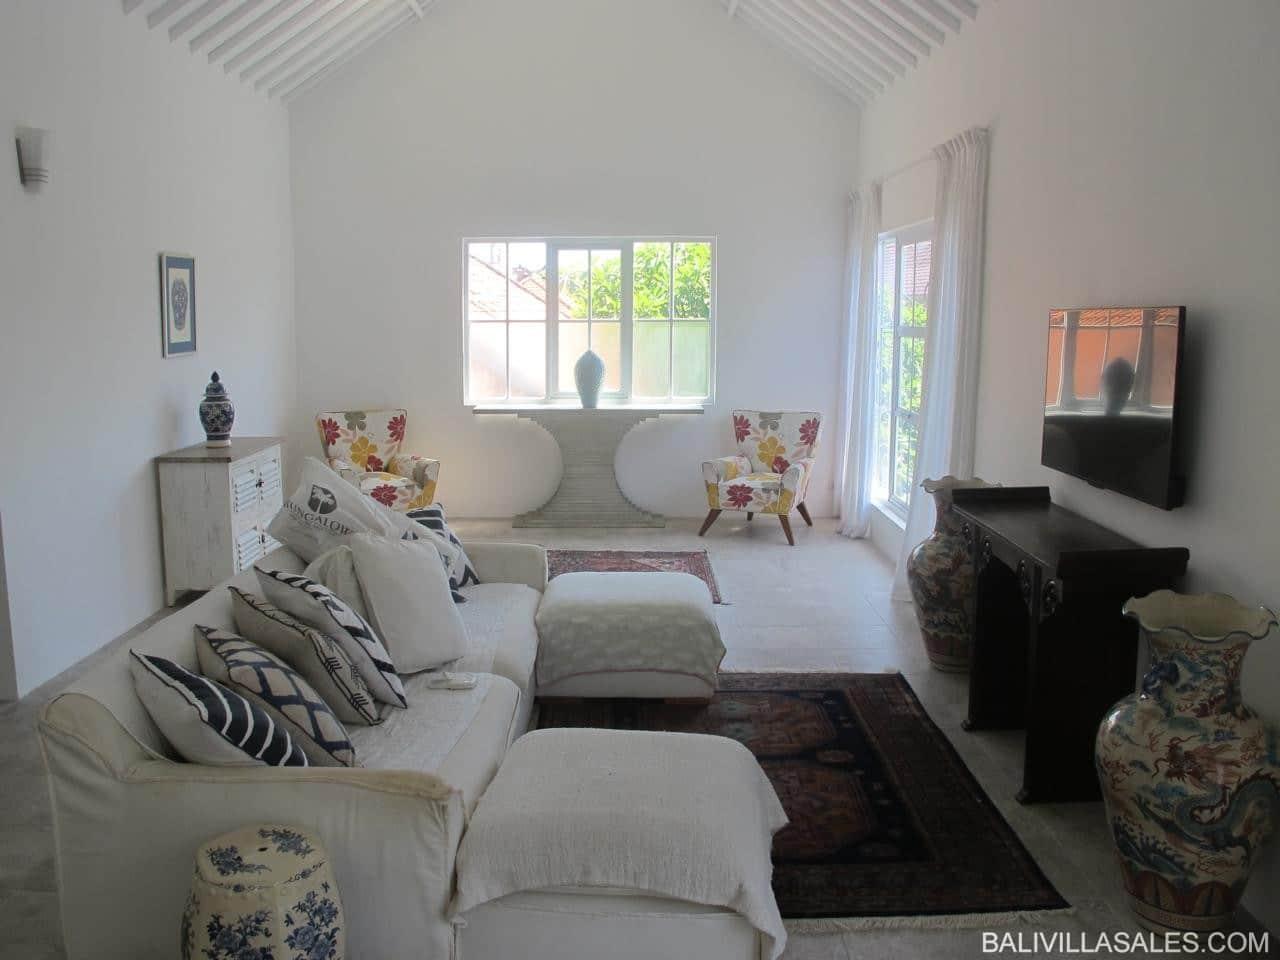 New Stylish 3 bedroom apartment with Pondok Wisata in Central Seminyak